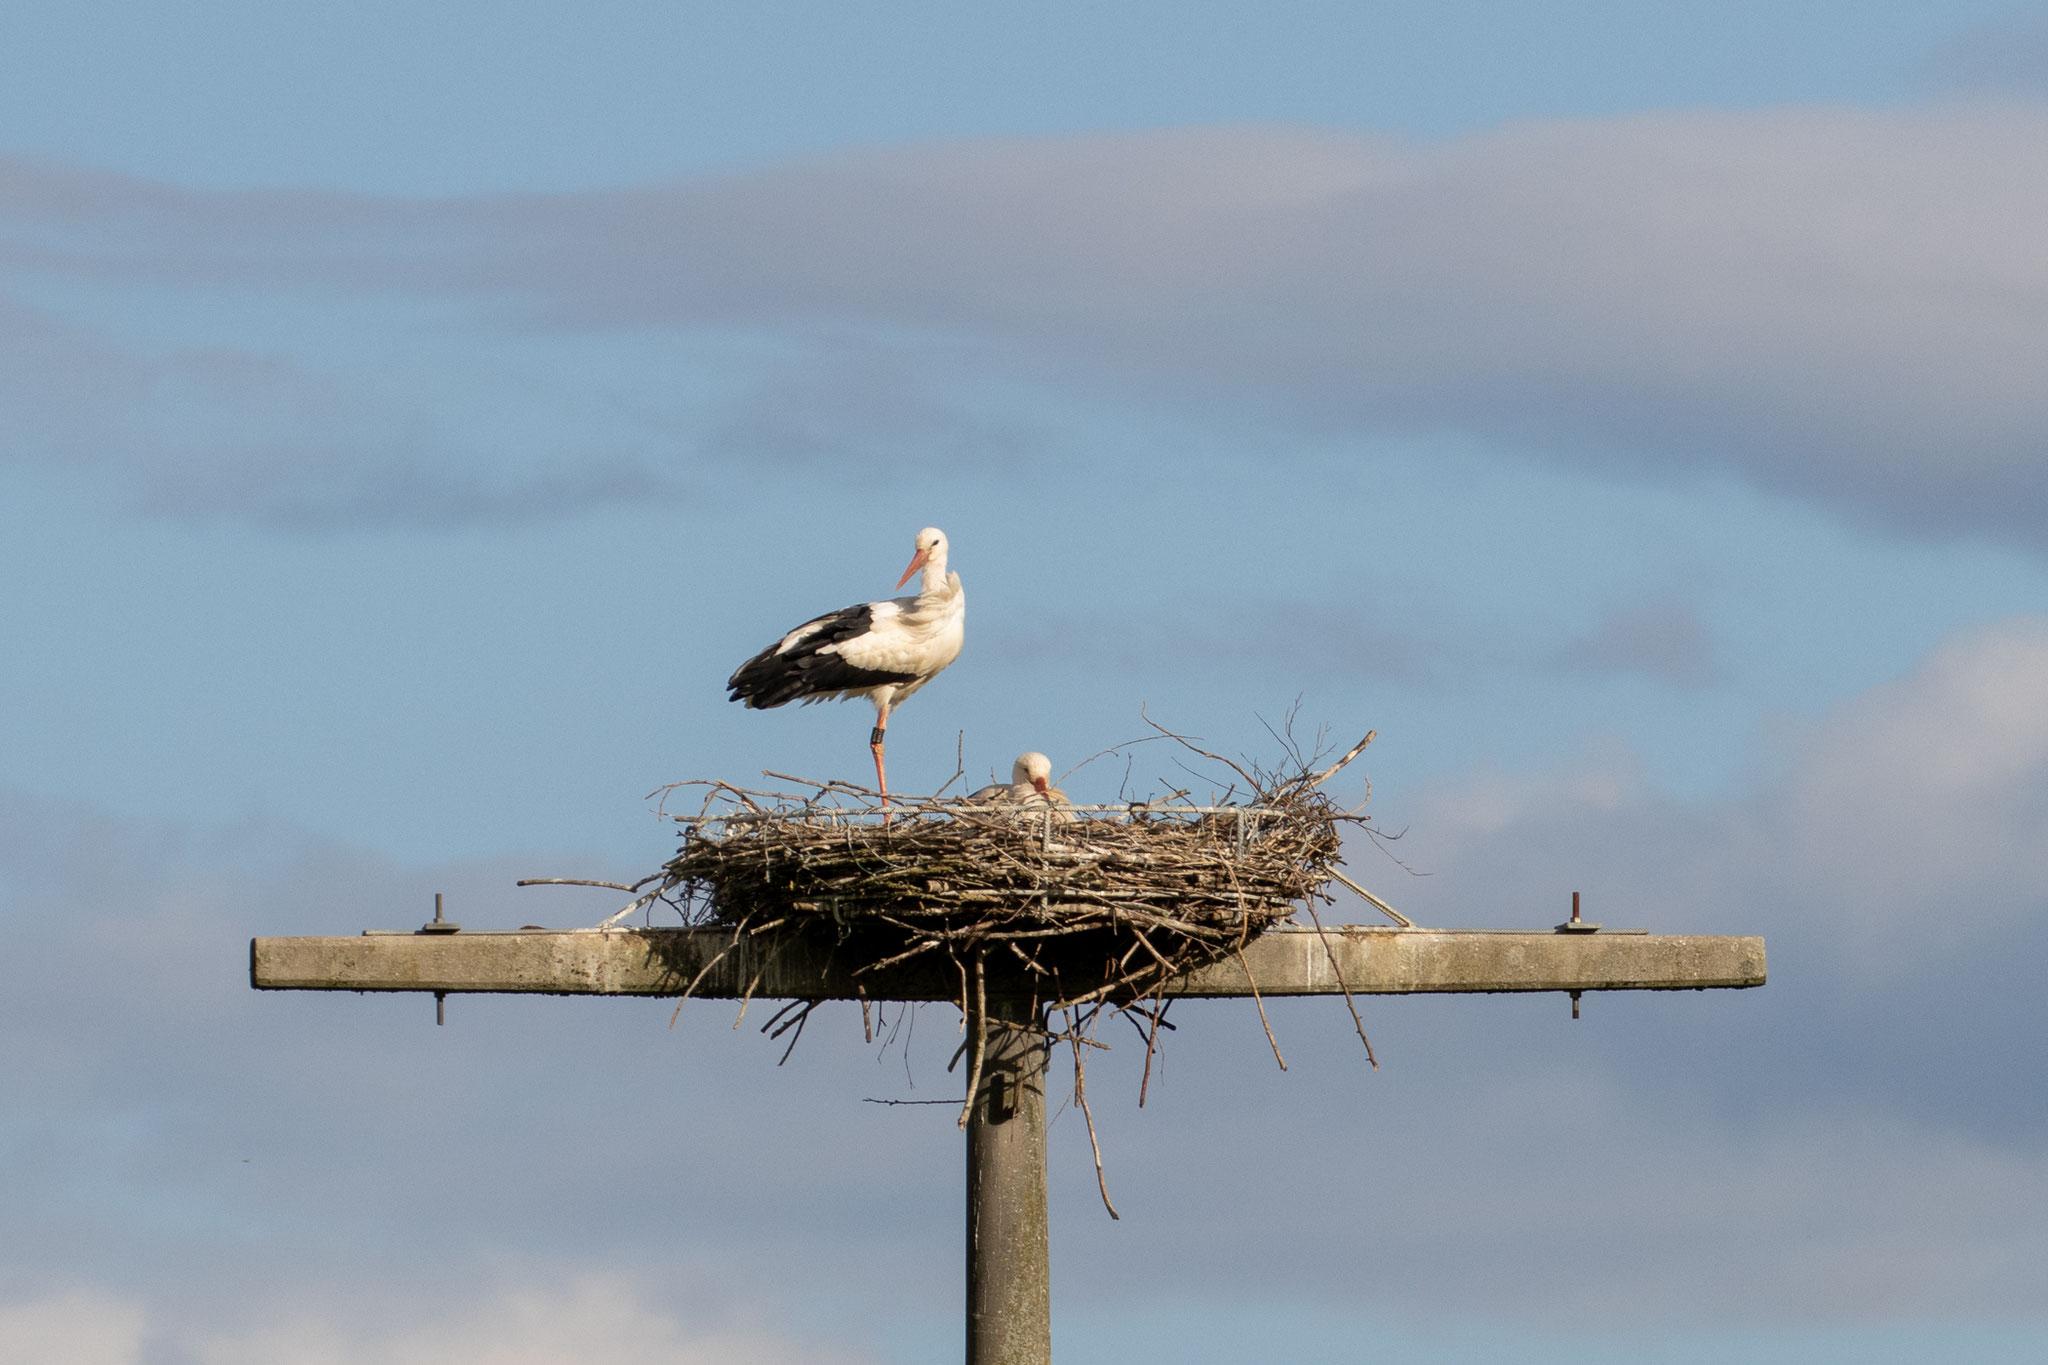 Storchenpaar im Nest am 23.05.21 (Foto: B. Budig)